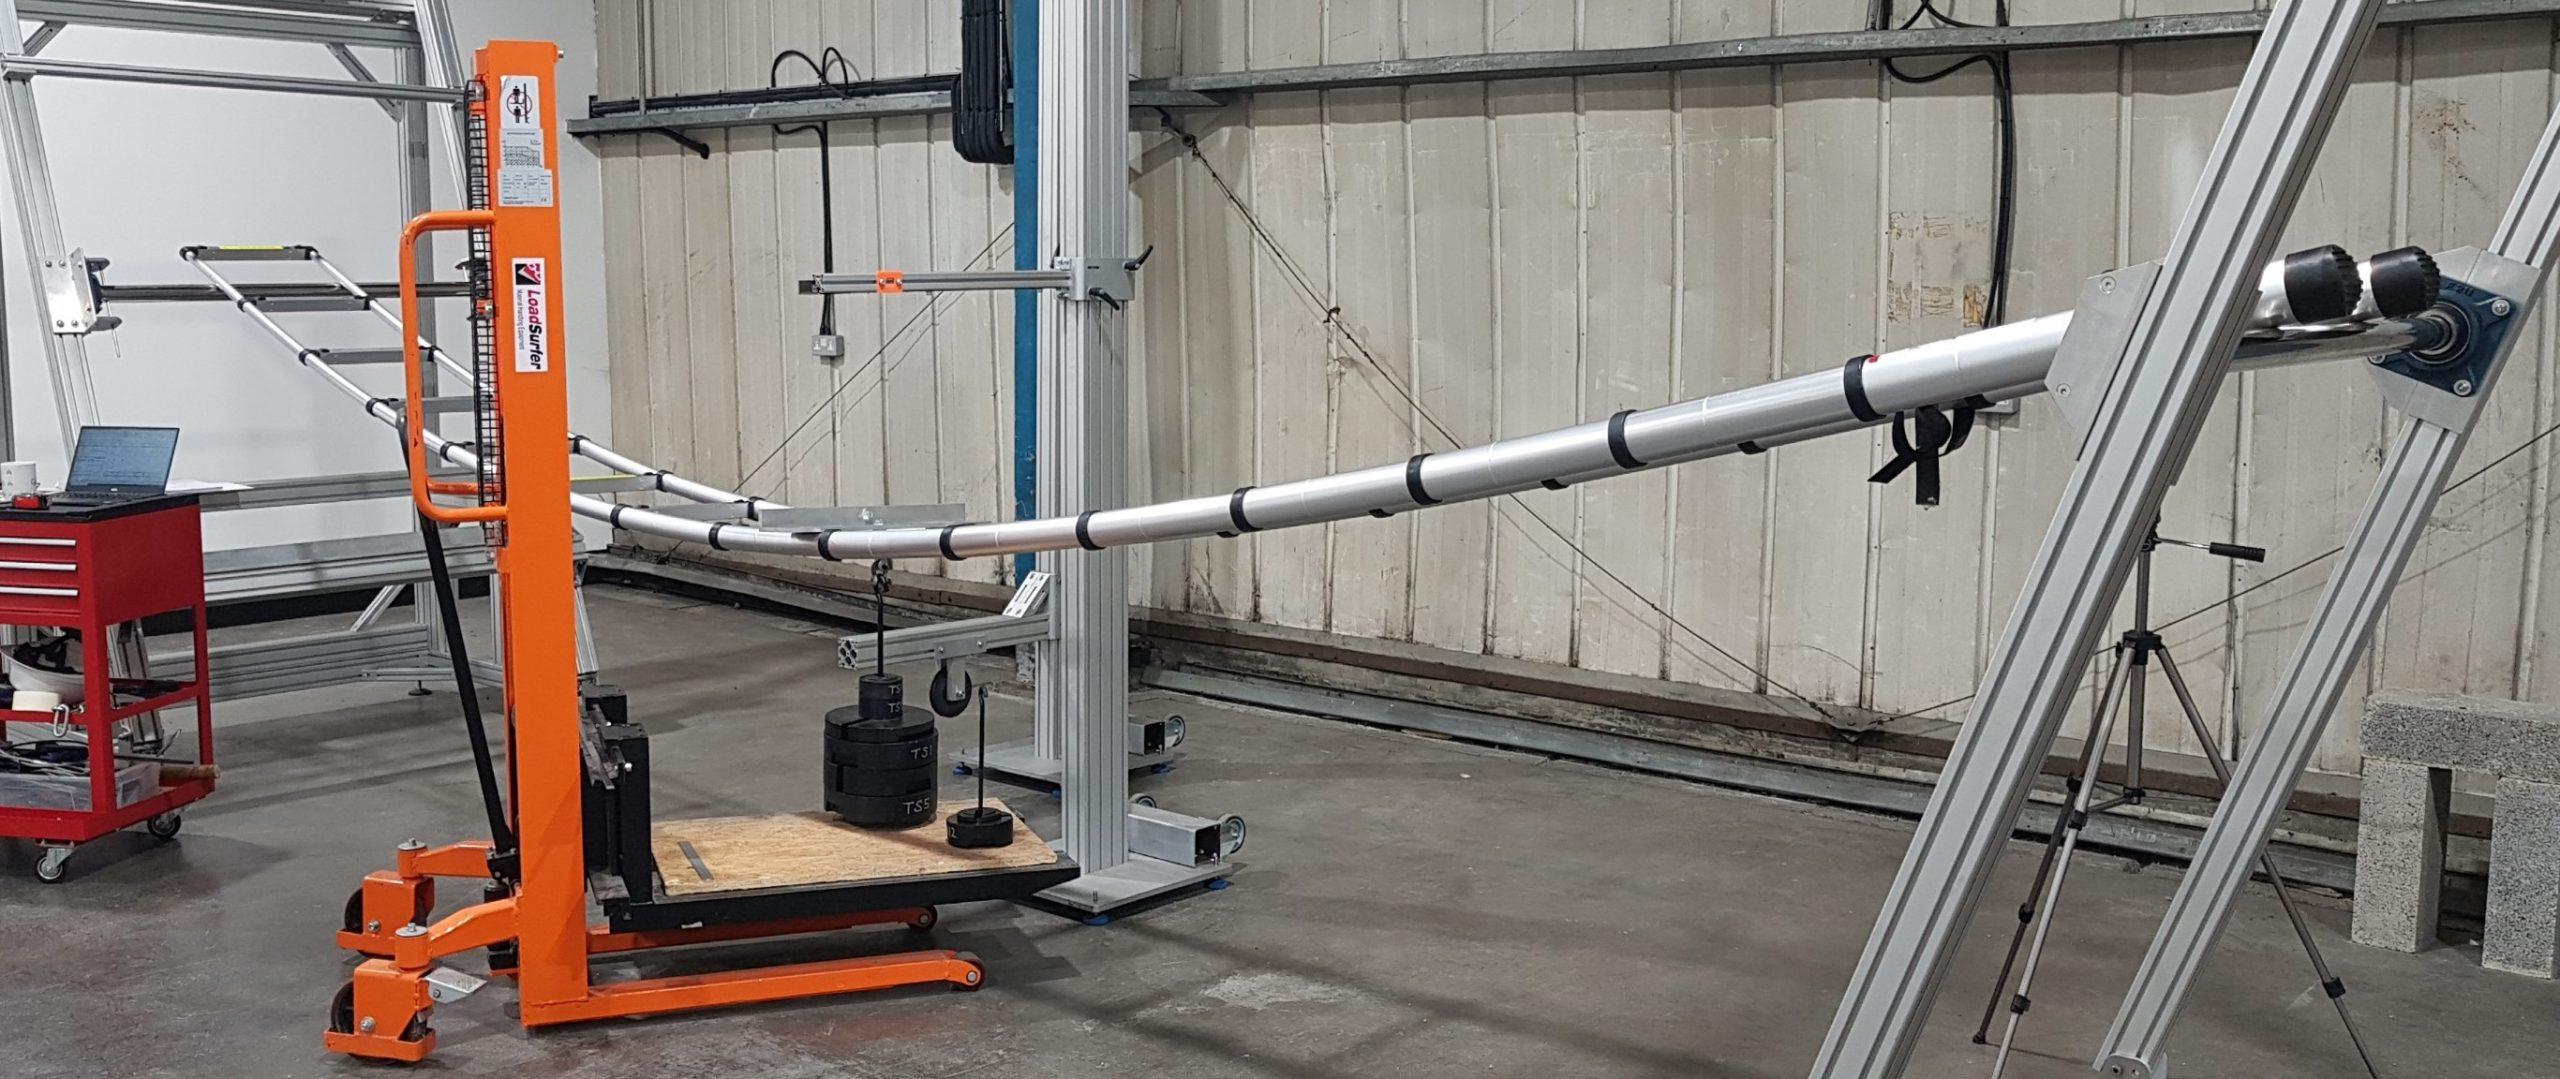 6.2m telescopic bending test